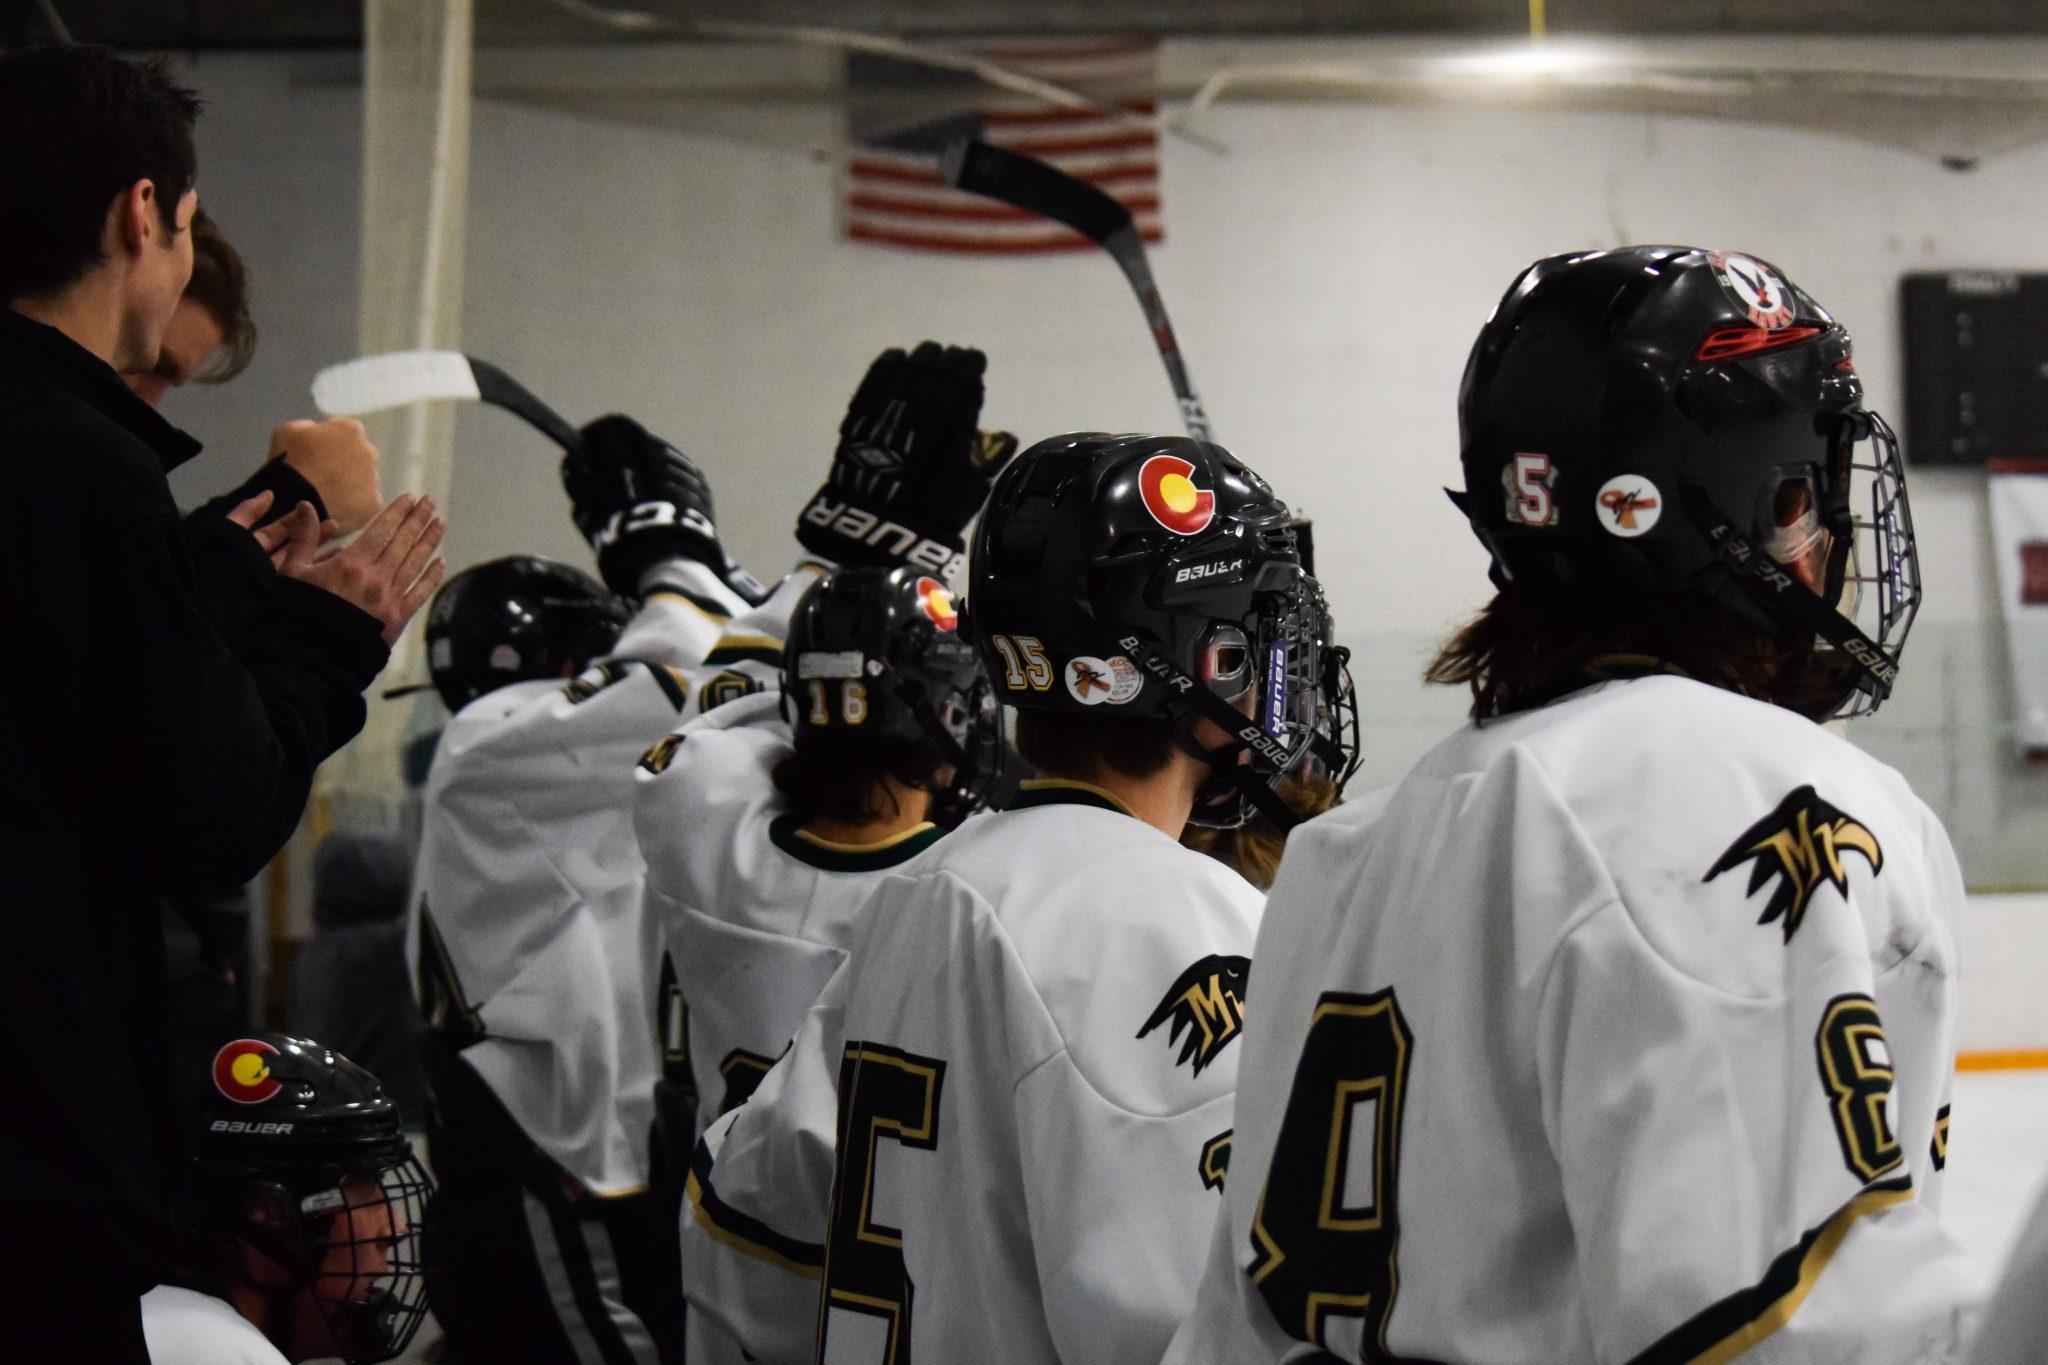 PHOTOS: Varsity Ice Hockey vs. Dakota Ridge